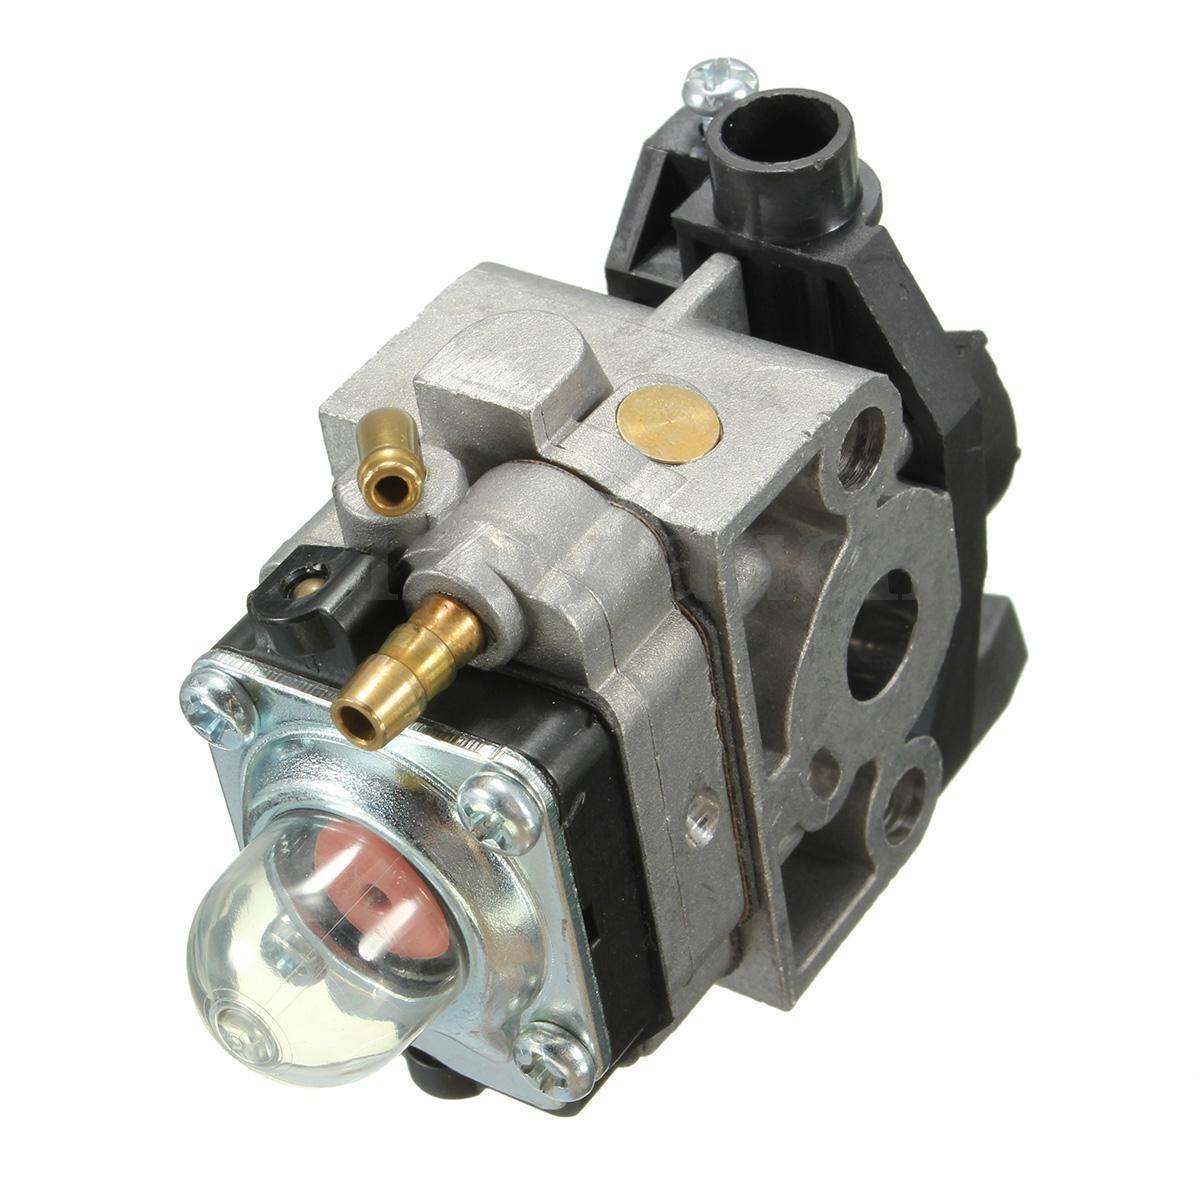 Lumix GC Carburetor For Honda HHB25 HHH25D and 50 similar items